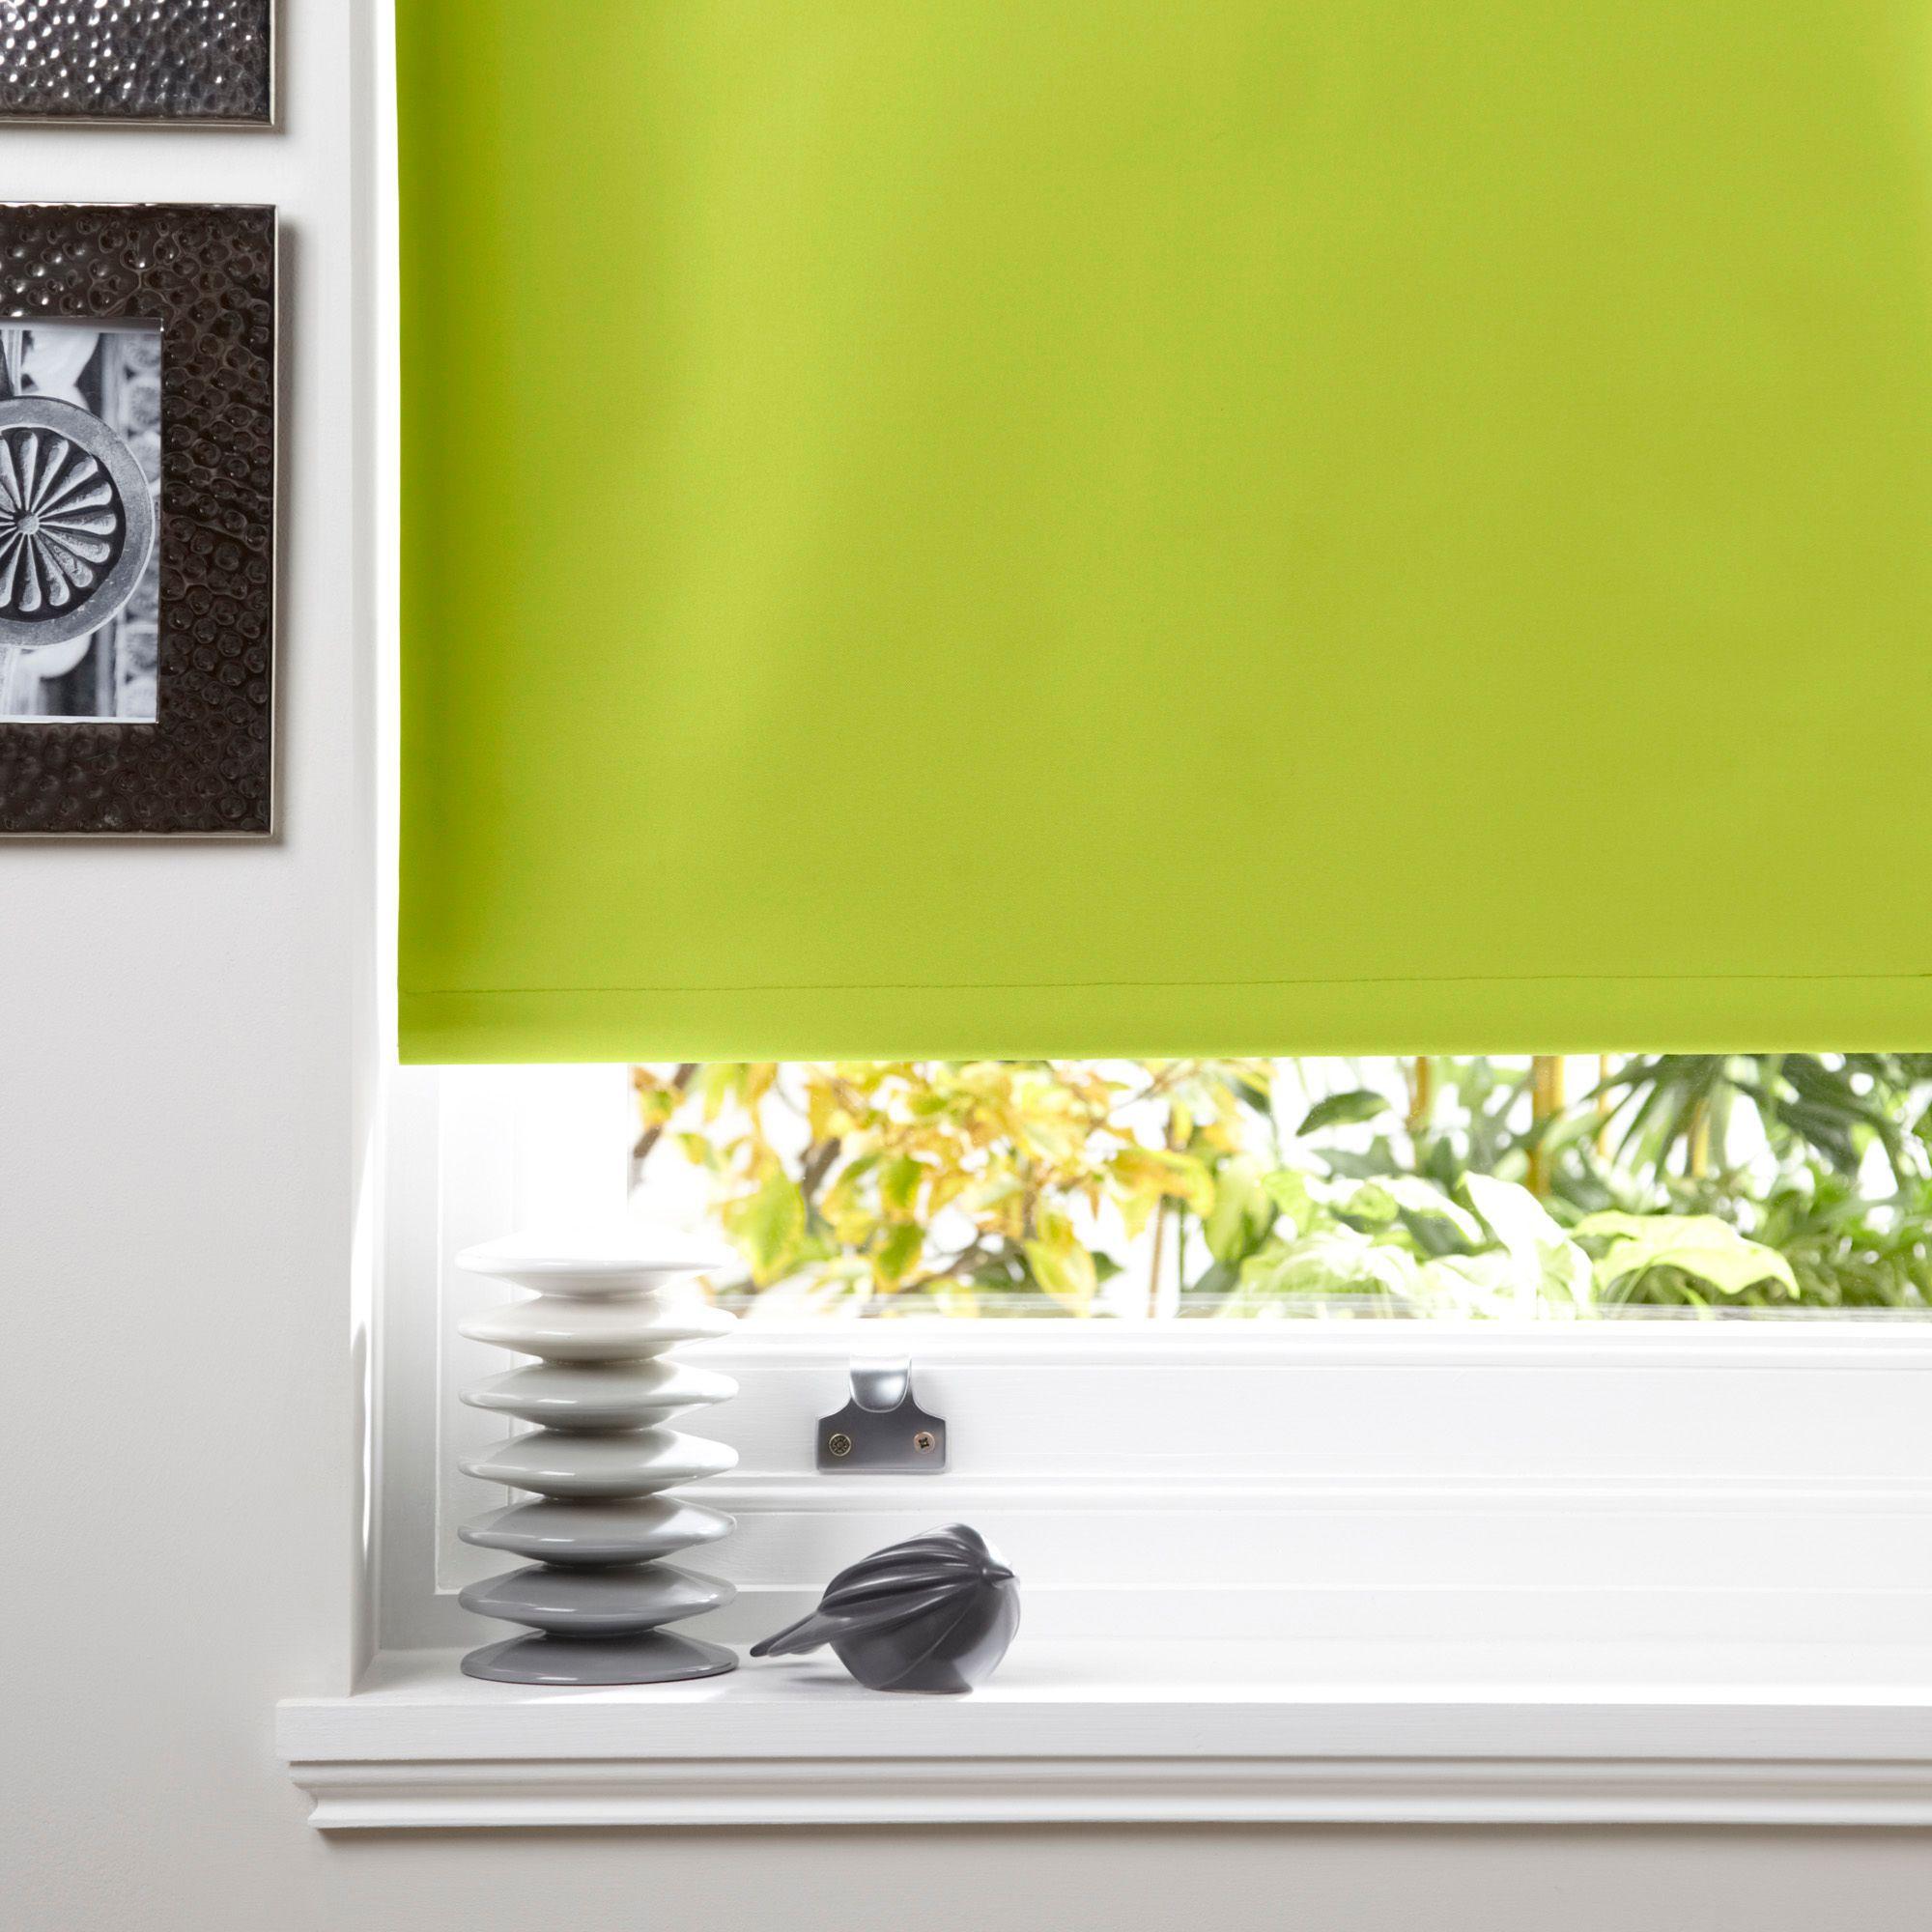 Bathroom Window Blinds B&Q colours kona corded chlorophyll roller blind (l)160 cm (w)180 cm